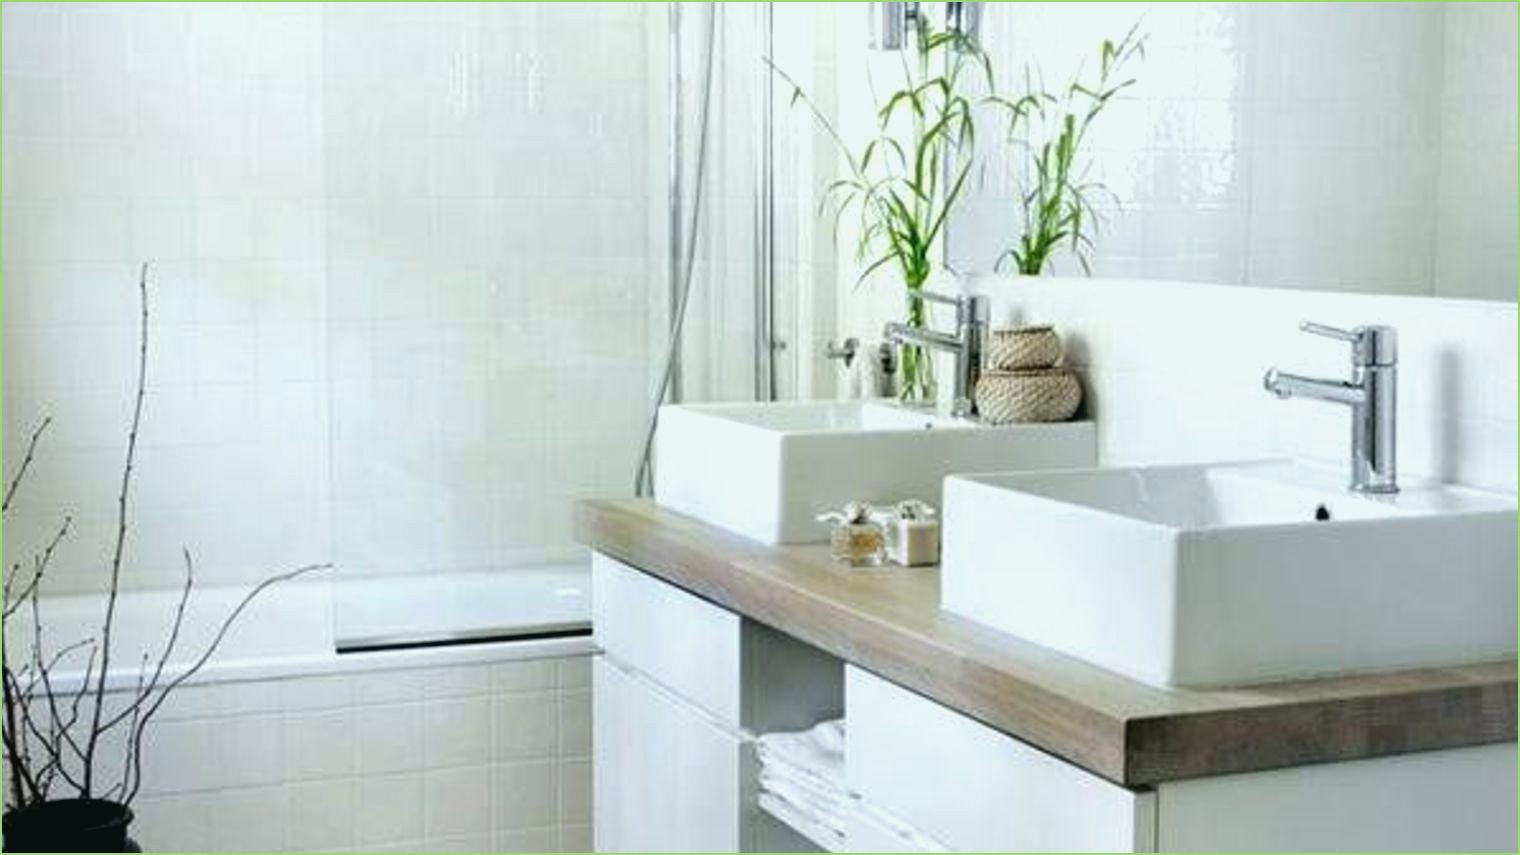 Plan De Travail Salle De Bain Ikea Meilleur De Images Luxe Plan De Travail Salle De Bain